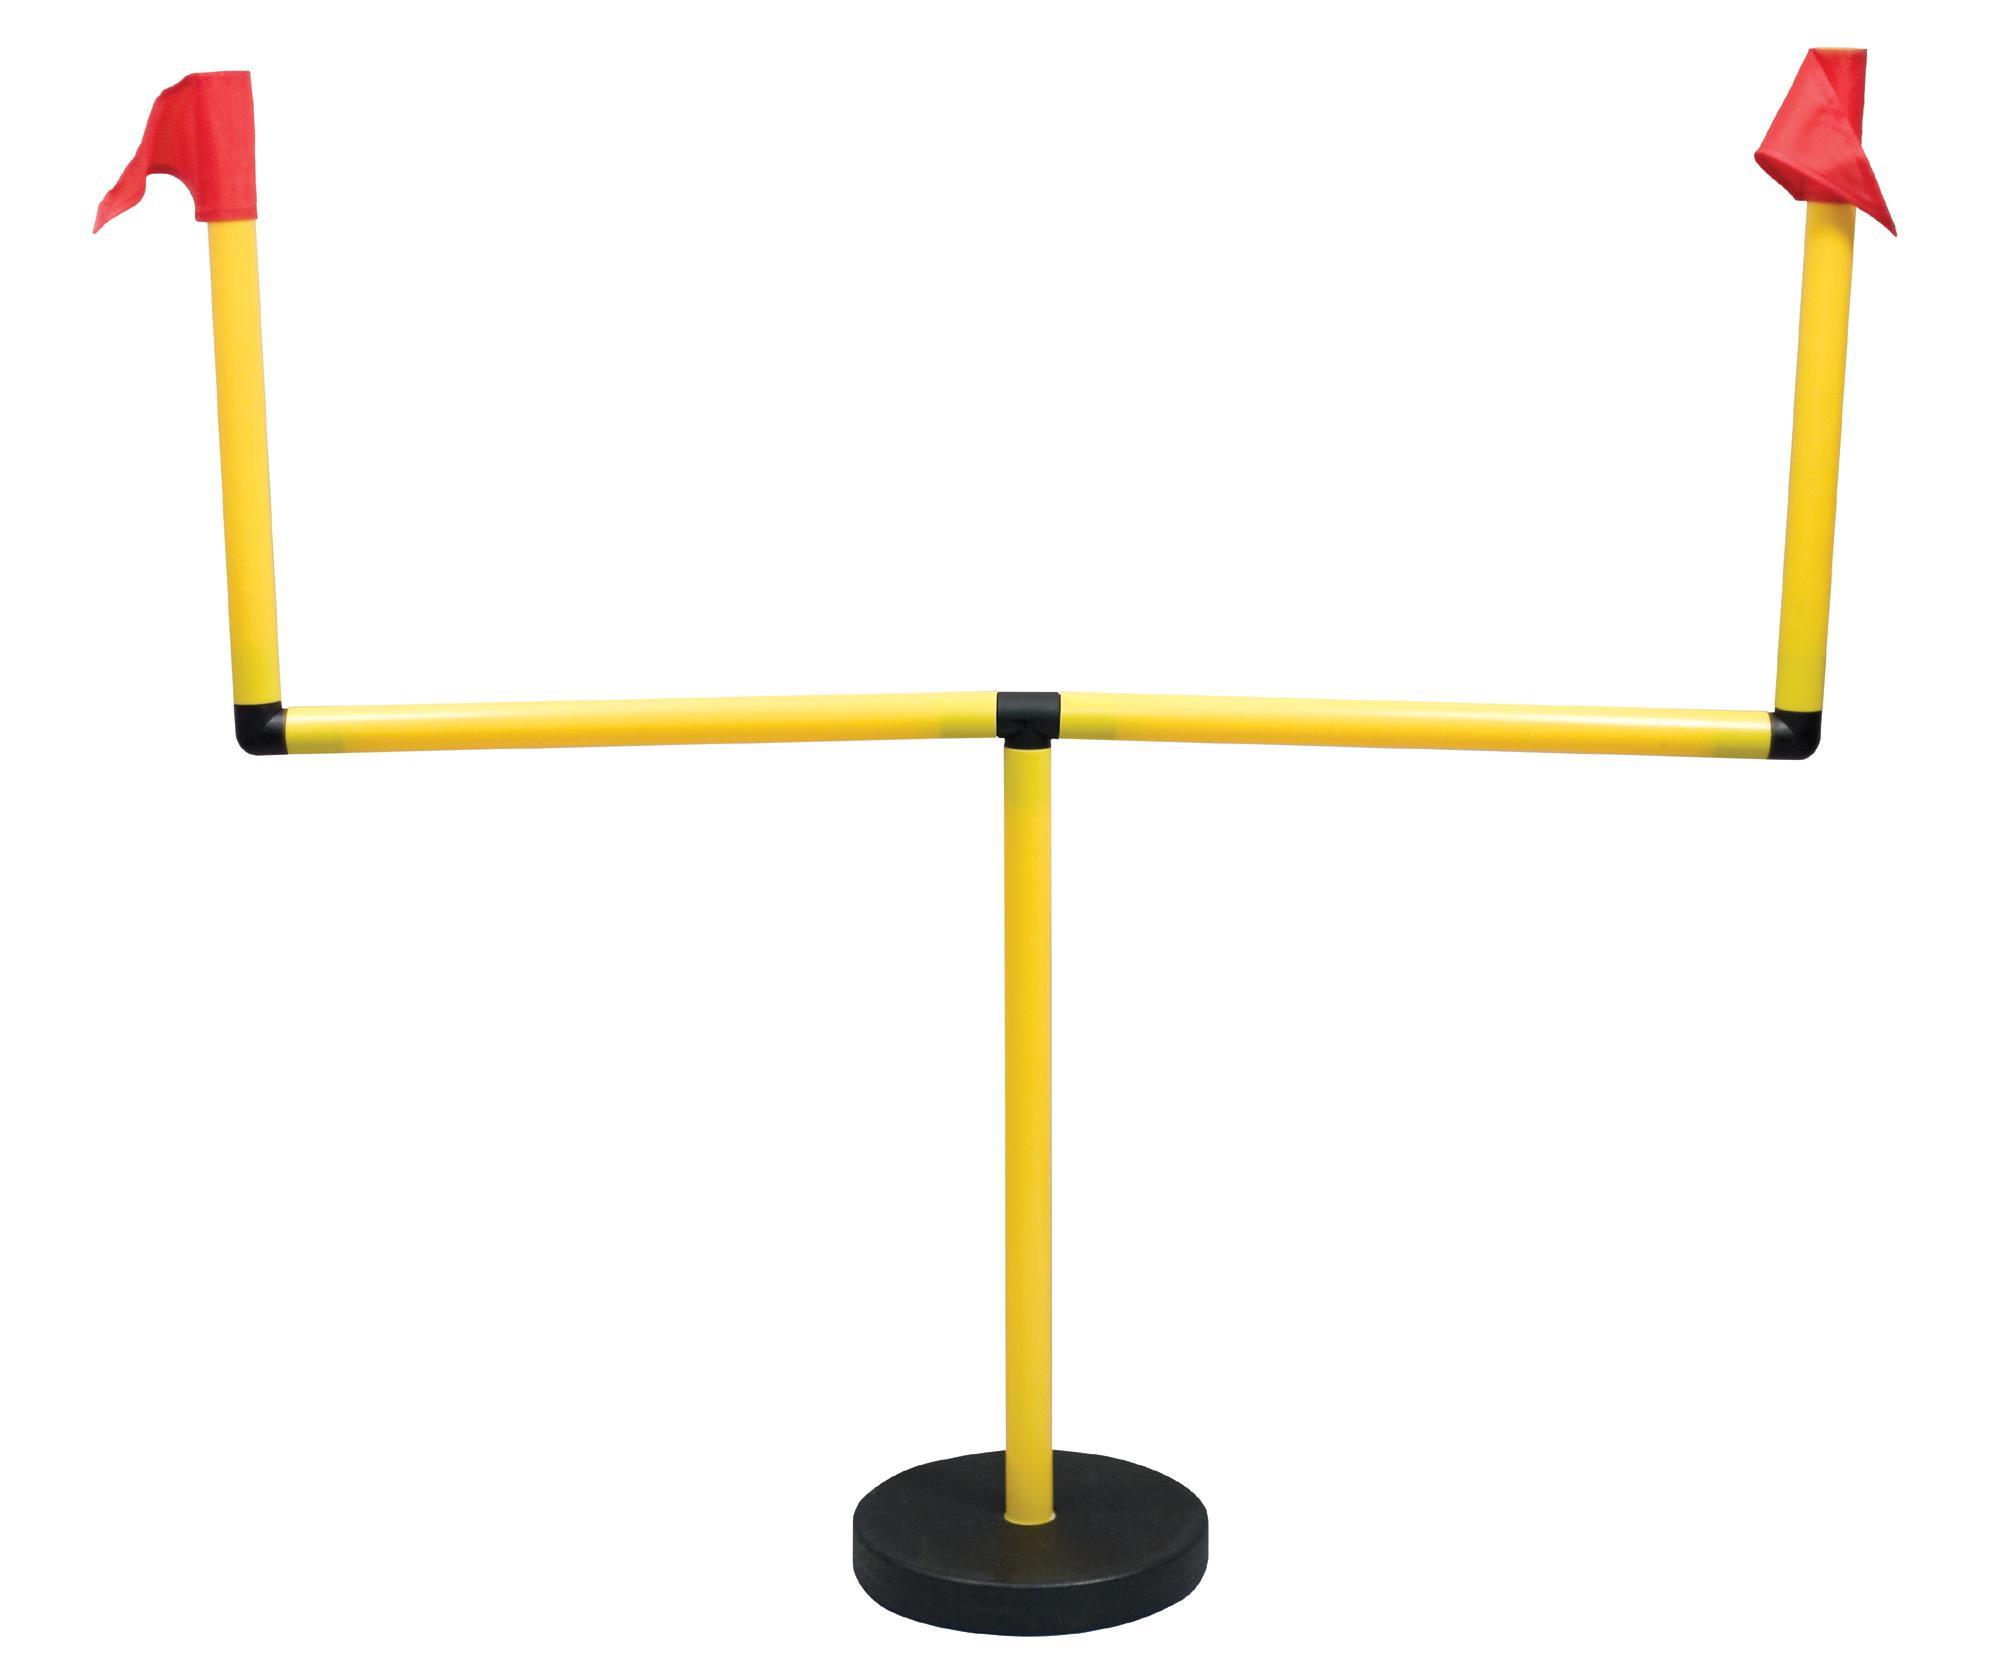 2000x1677 Football Goal Post Clipart